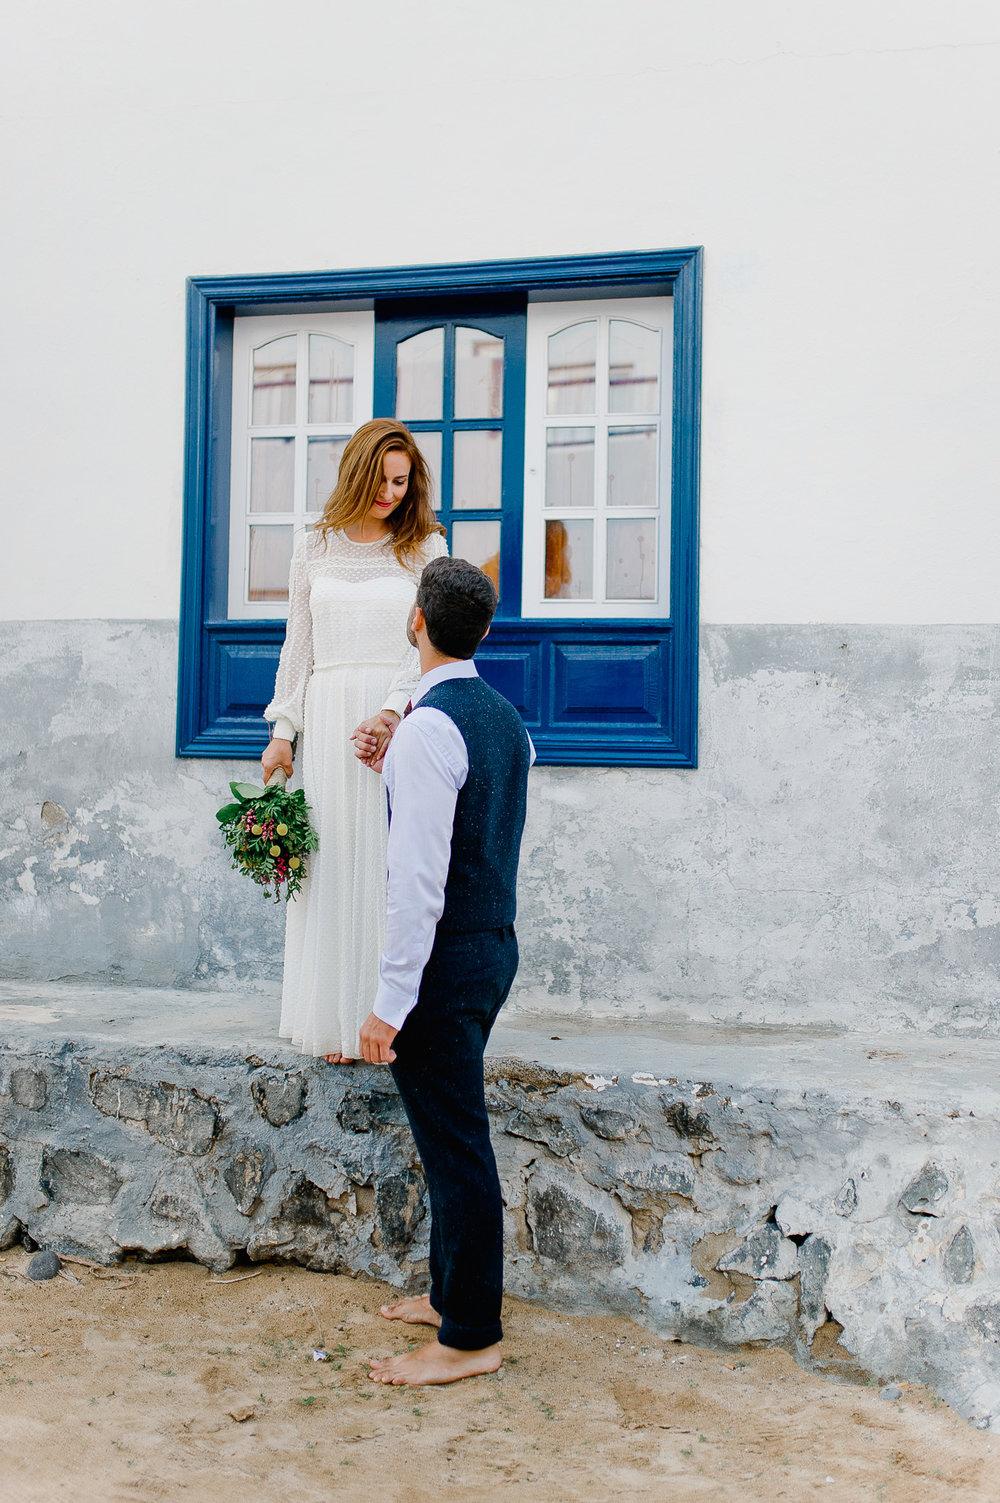 anna hari wedding photography-13.jpg